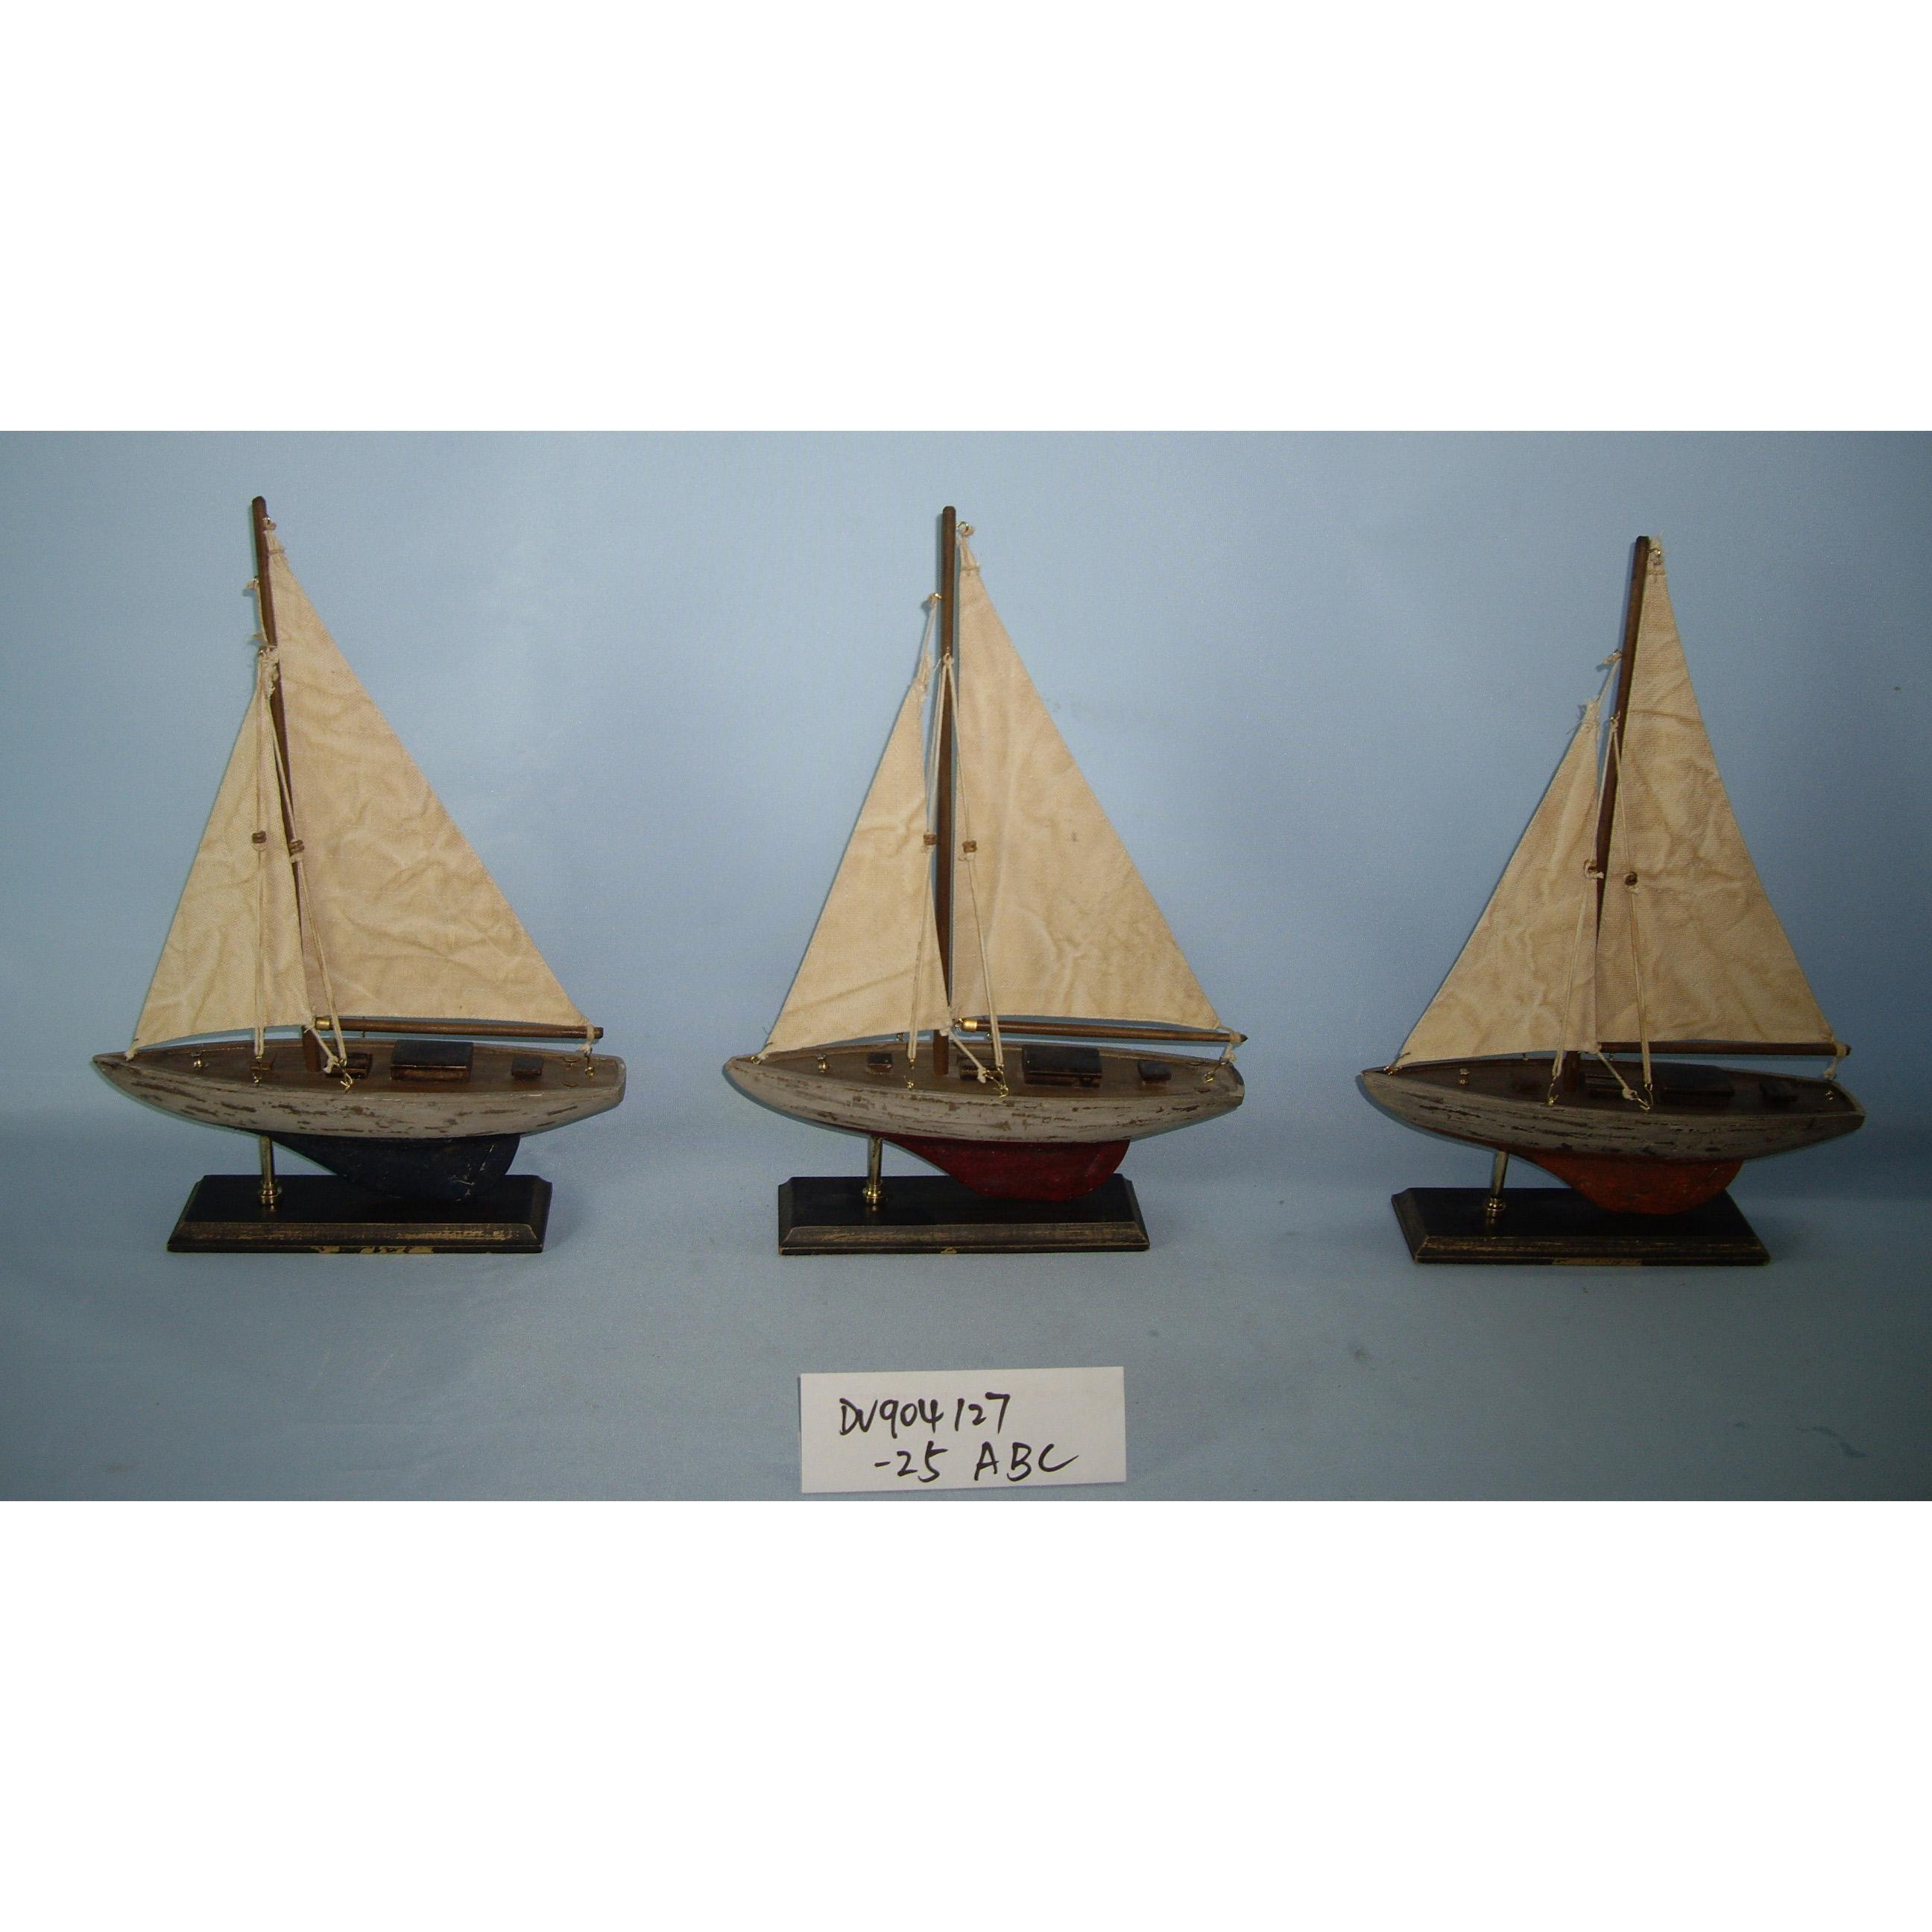 Set 3 Wooden Boat Model,25x6x34cm Small Sailboat Model,Single Mast Sail  Yacht Model - Buy Old Ship Model,Wooden Model Boats,Nautical Boat Product  on